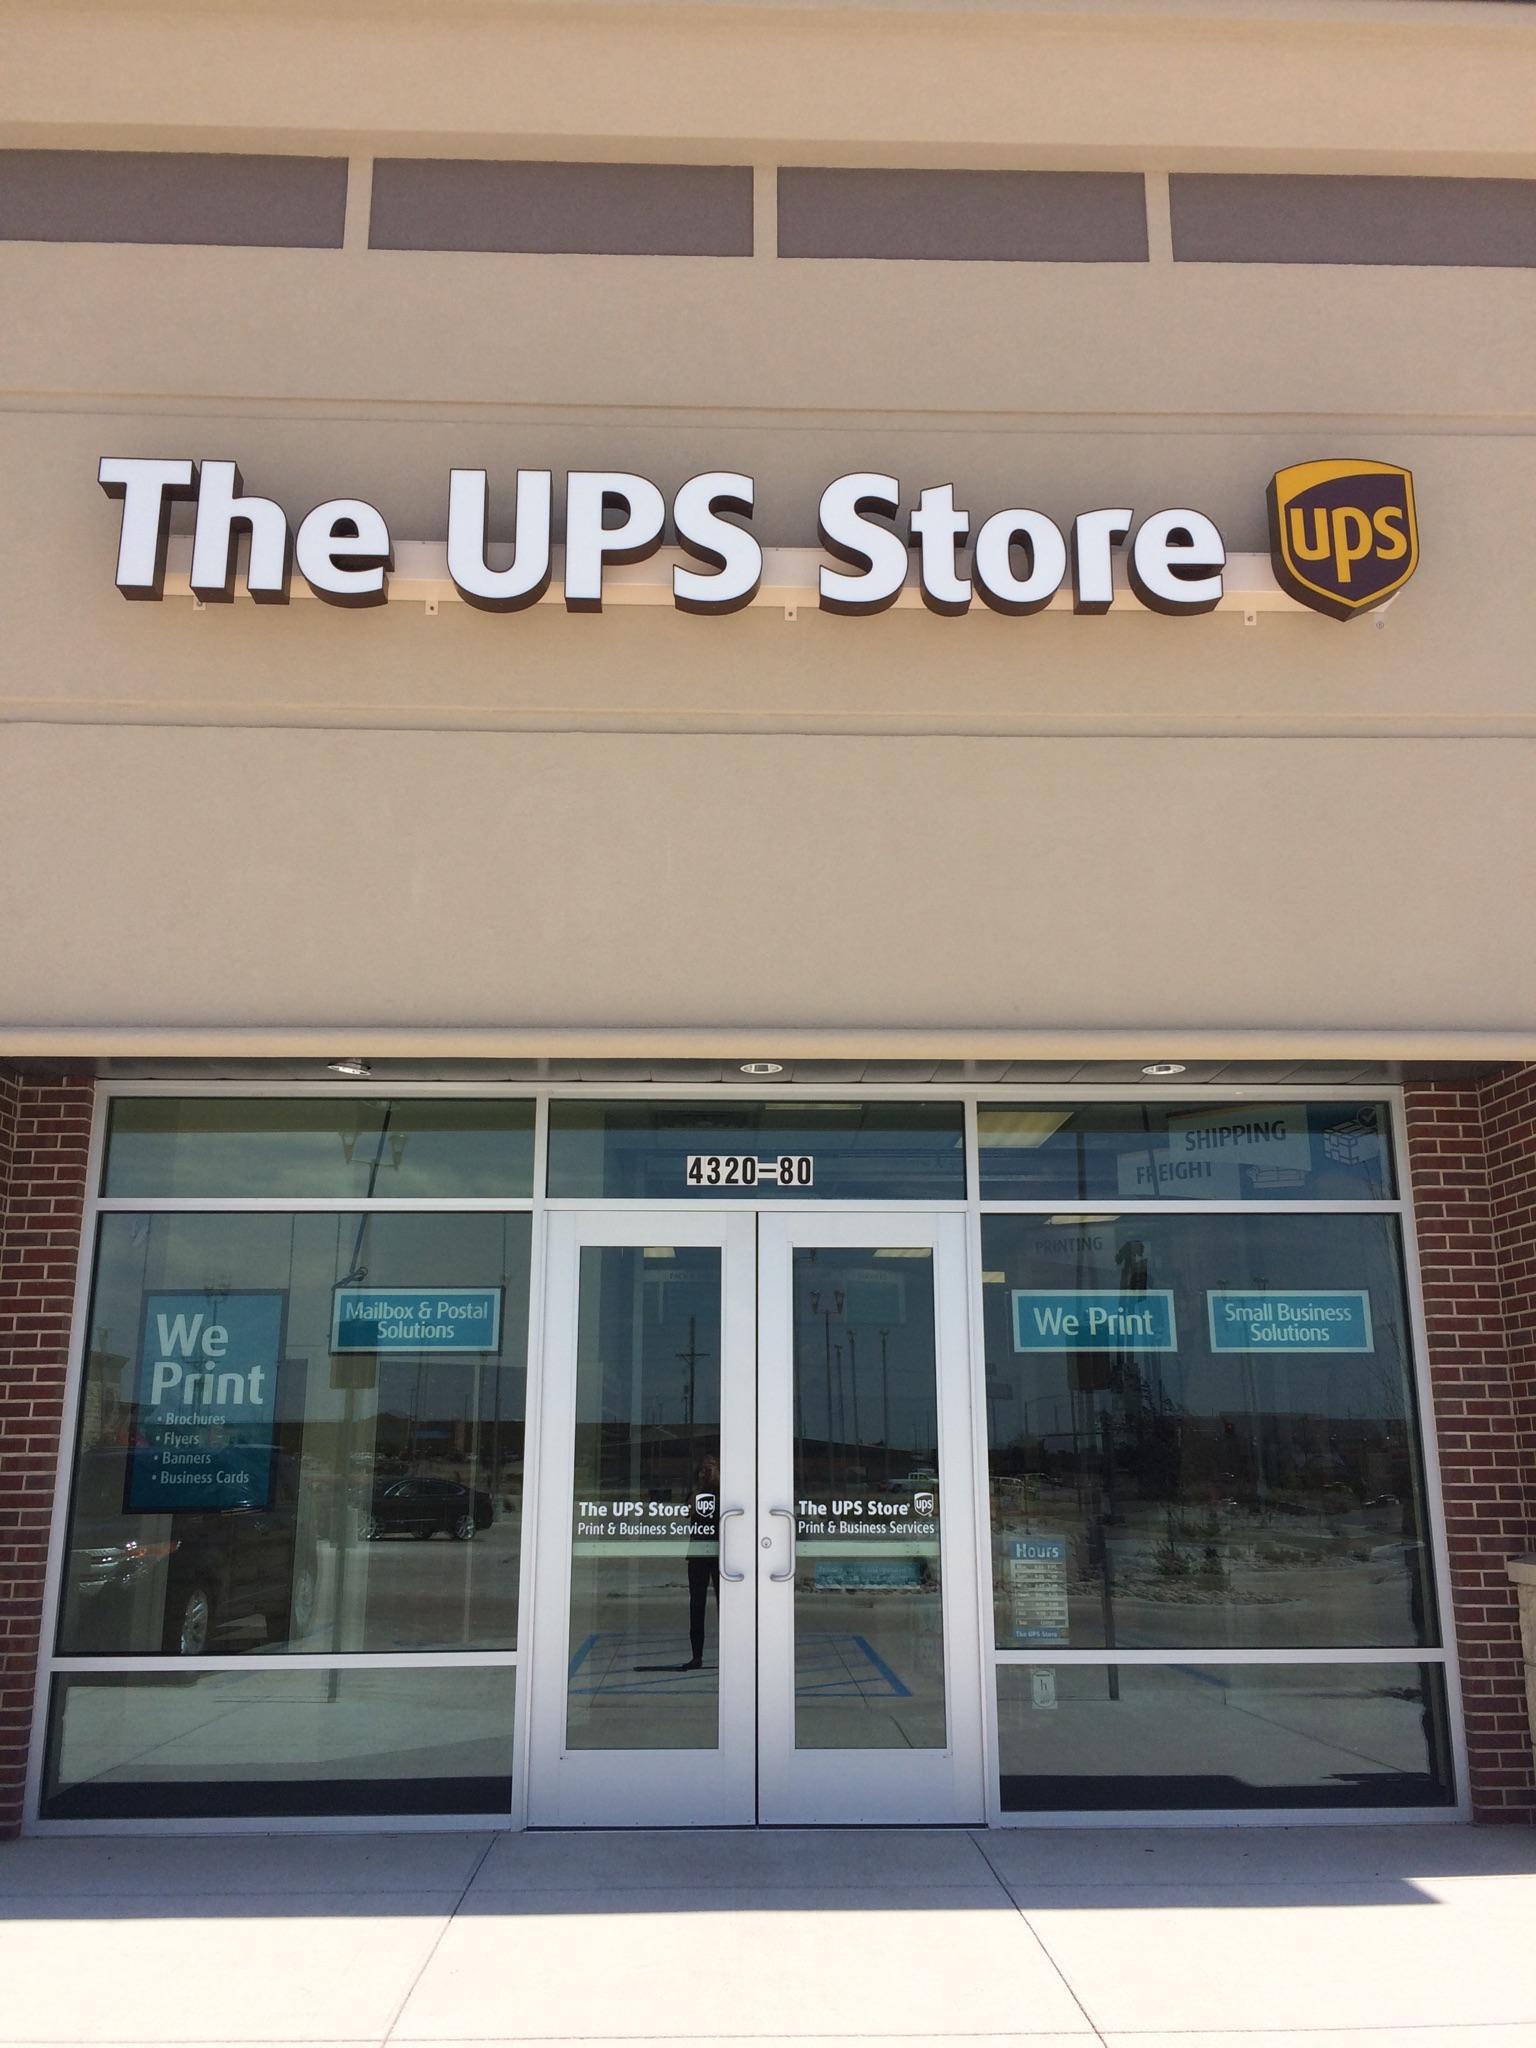 The Ups Store 4320 Vine St Ste 80 Hays Ks 67601 Yp